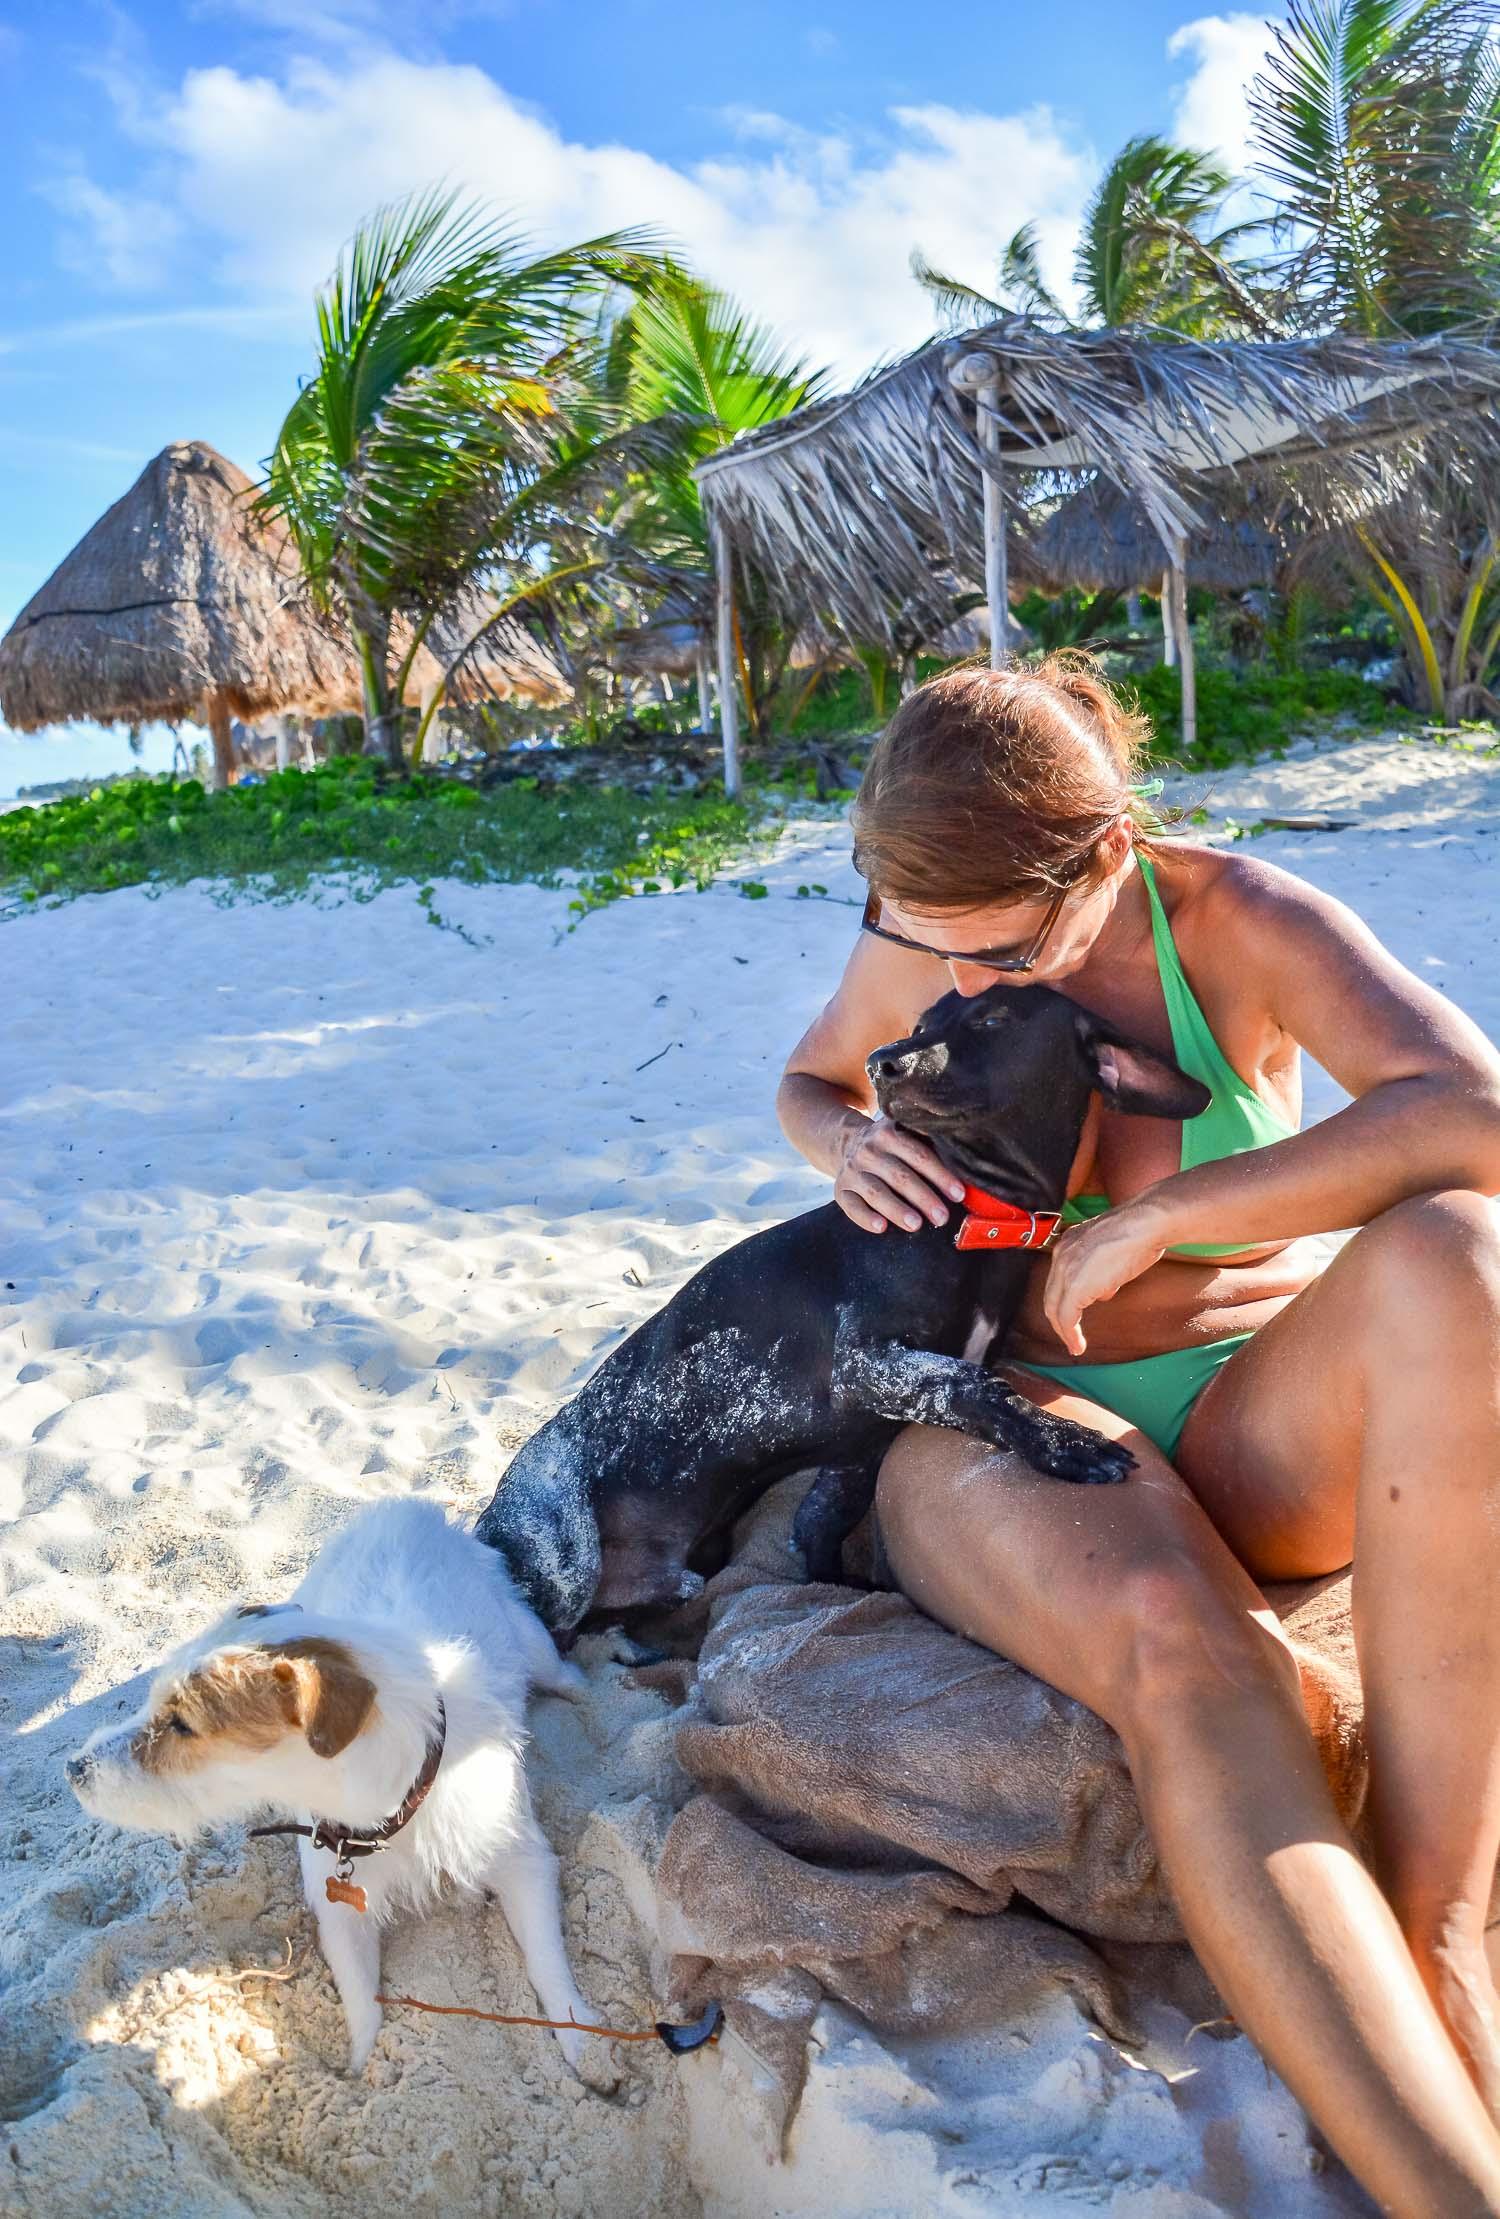 Pippen, Berto and Ariane - Tulum, Mexico